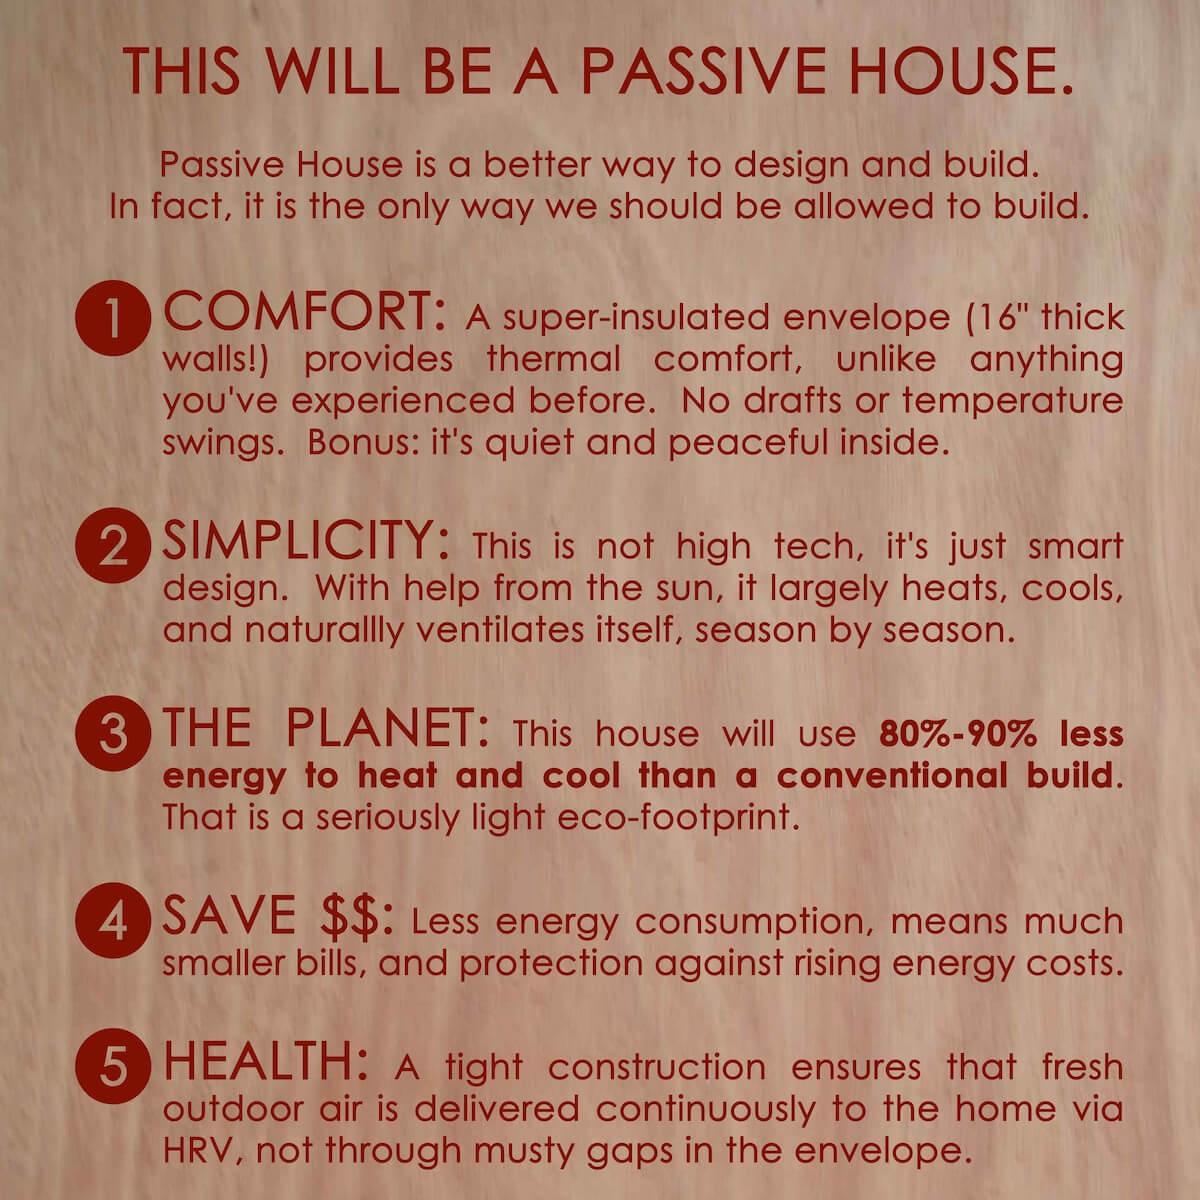 OneSEED_Khotso_Passive_House Sign Square